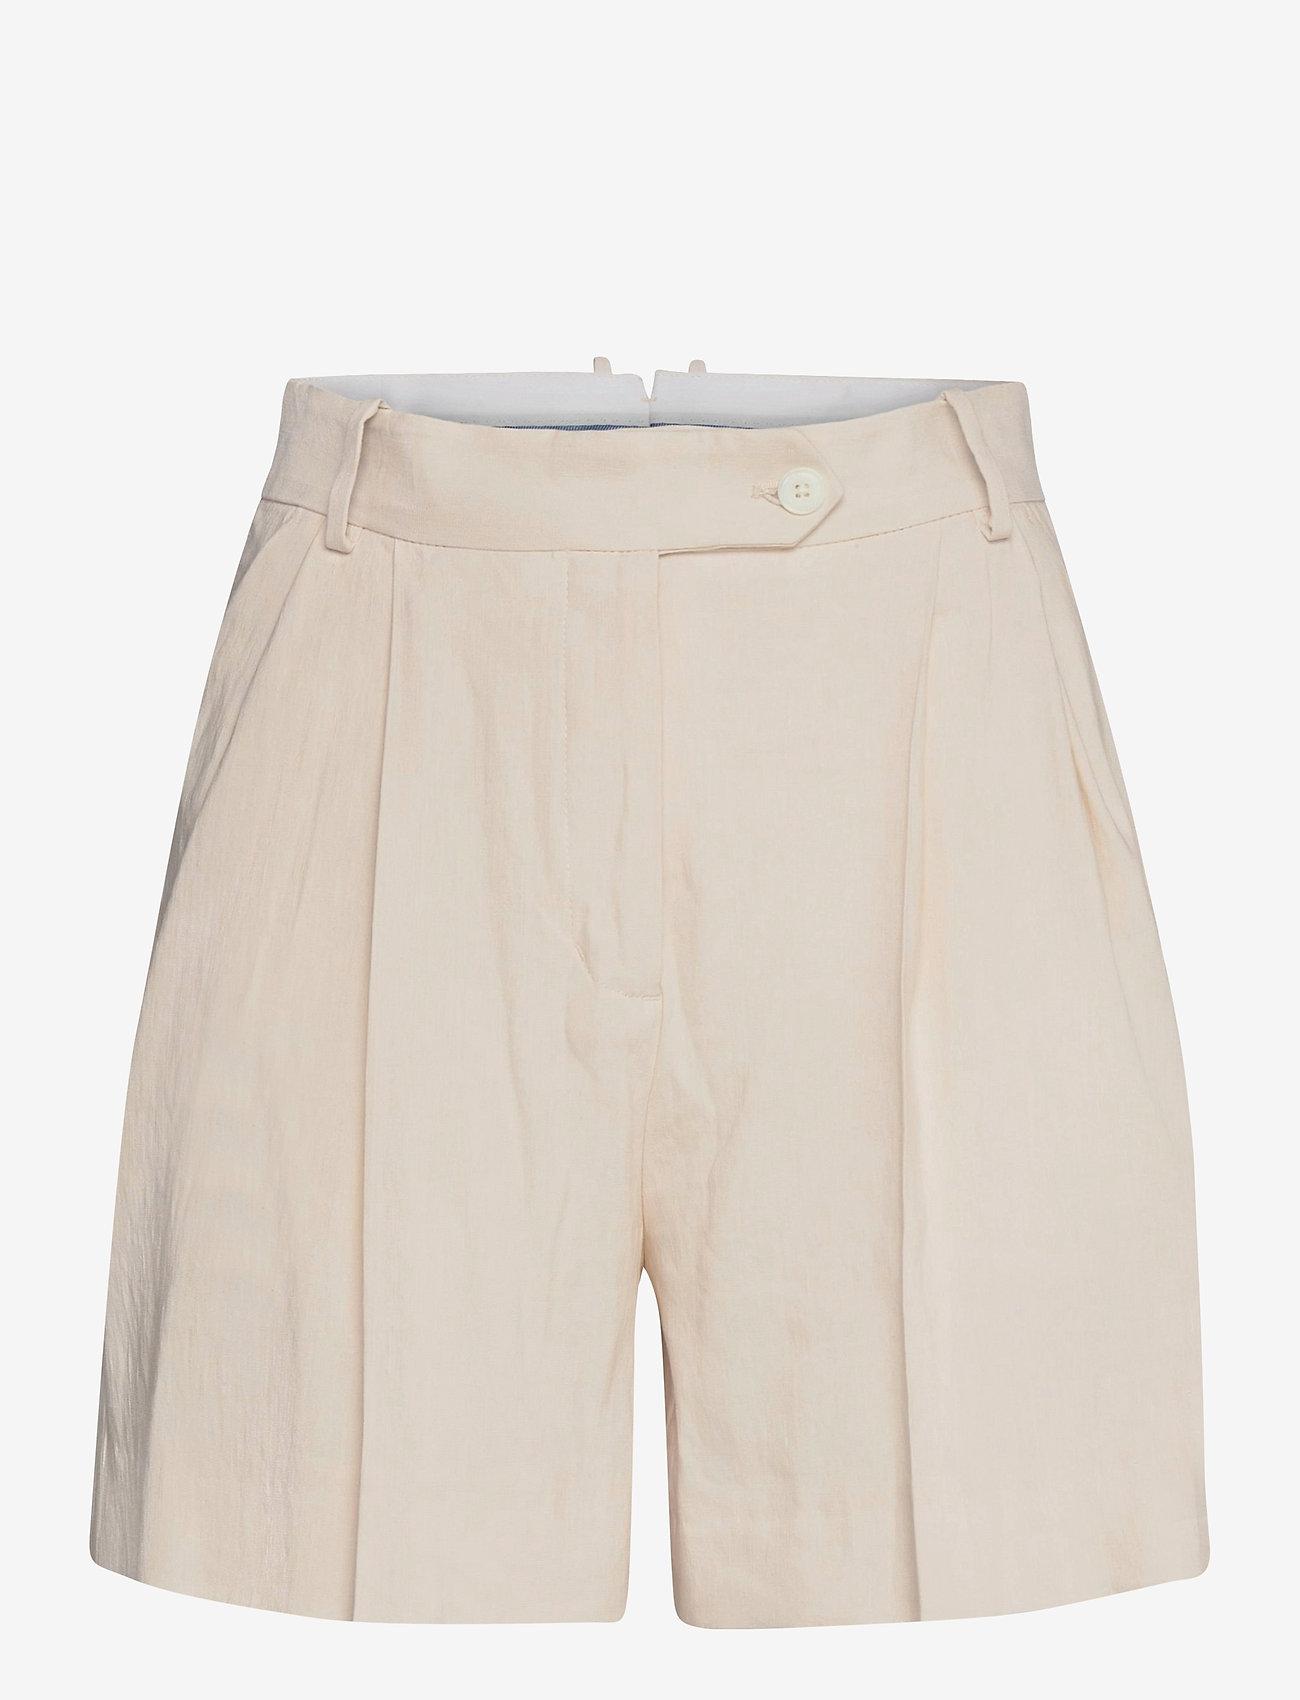 GANT - D2. STRETCH LINEN SHORTS - chino shorts - putty - 0